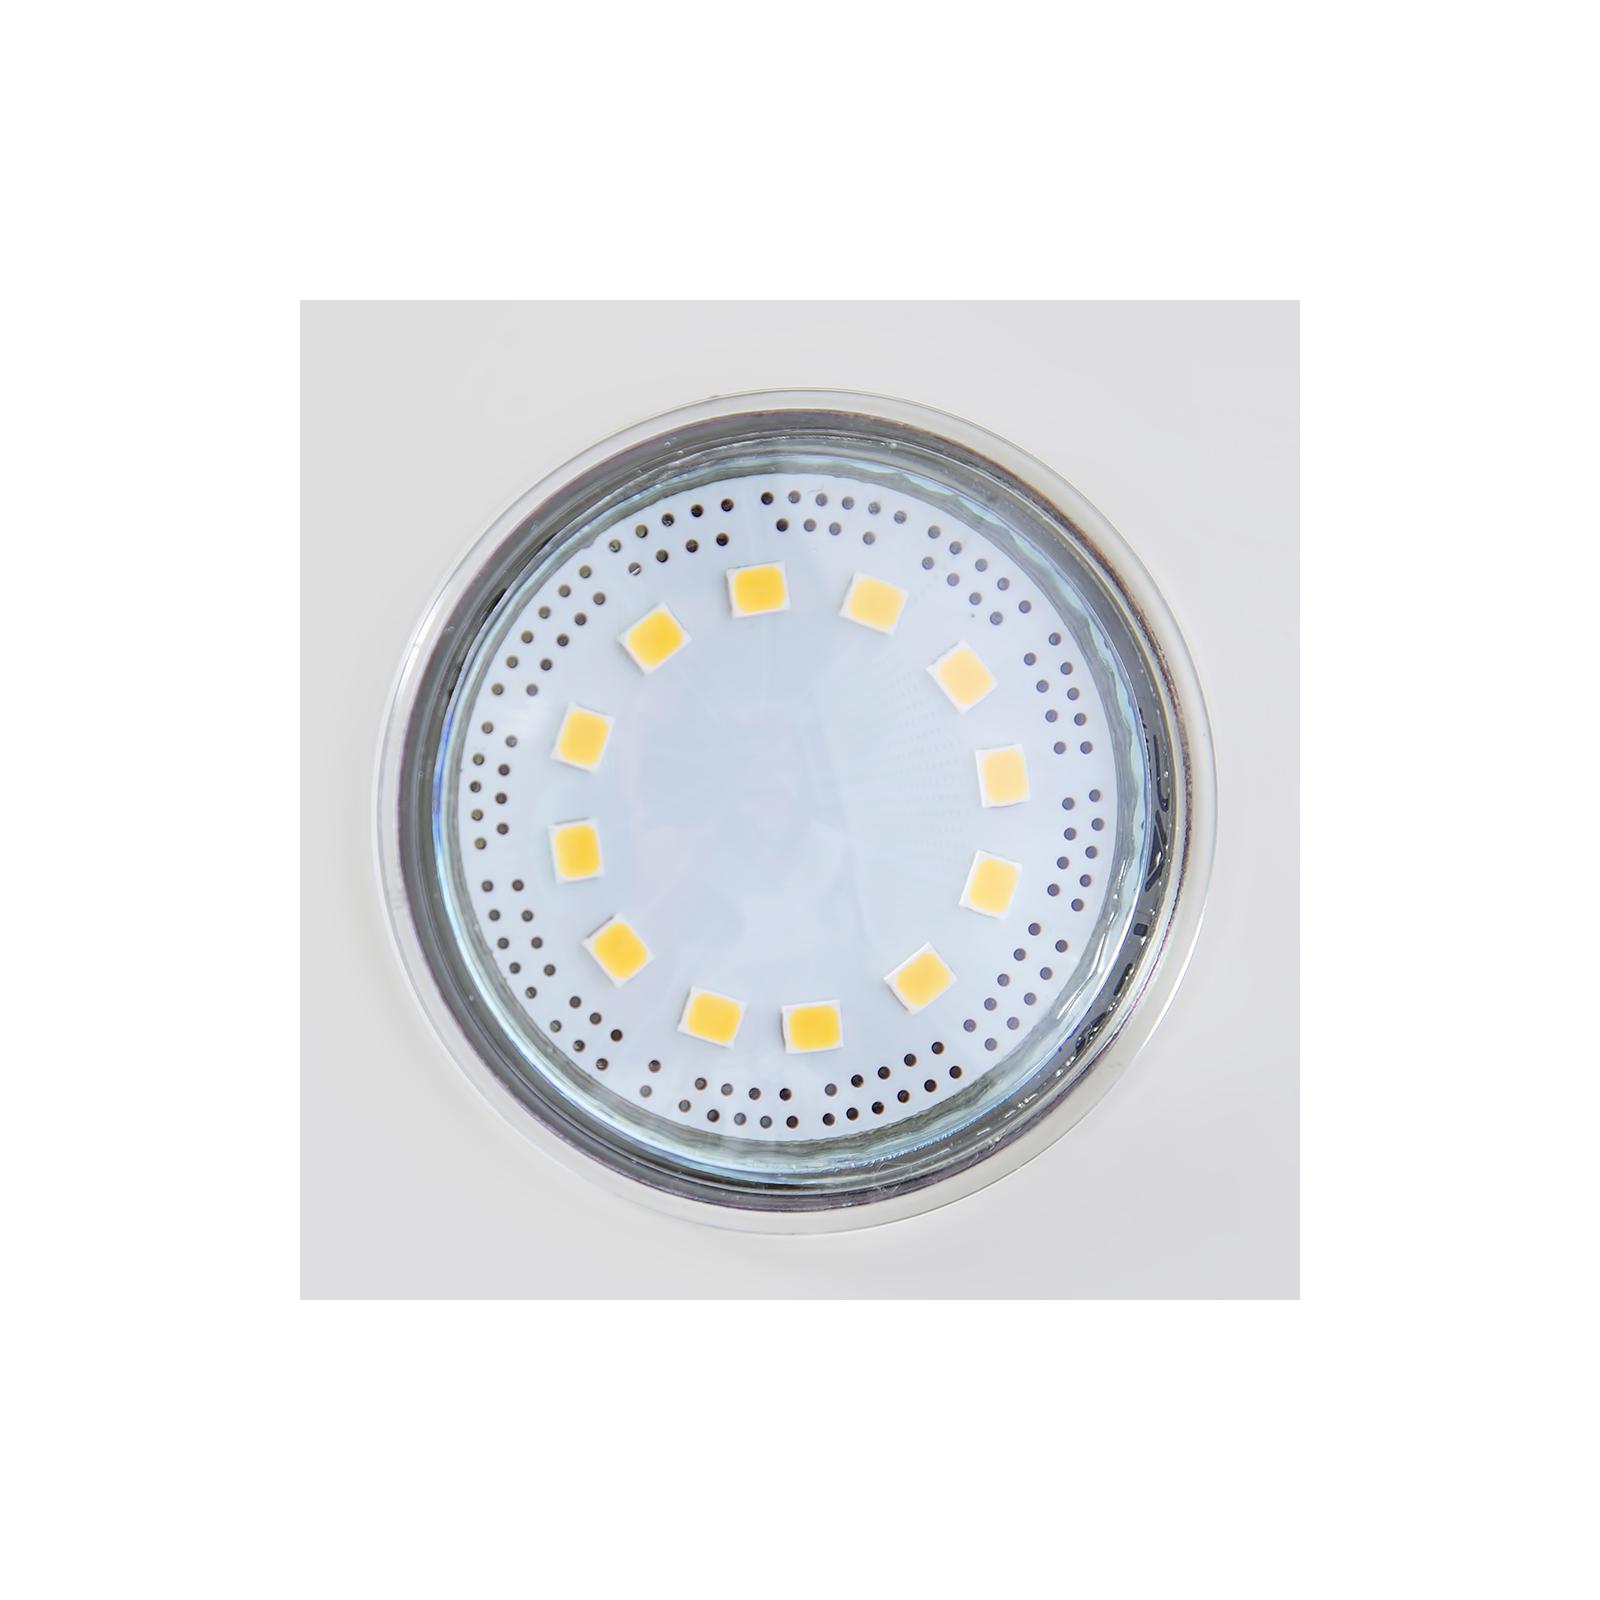 Вытяжка кухонная Perfelli TL 6112 IV LED изображение 6